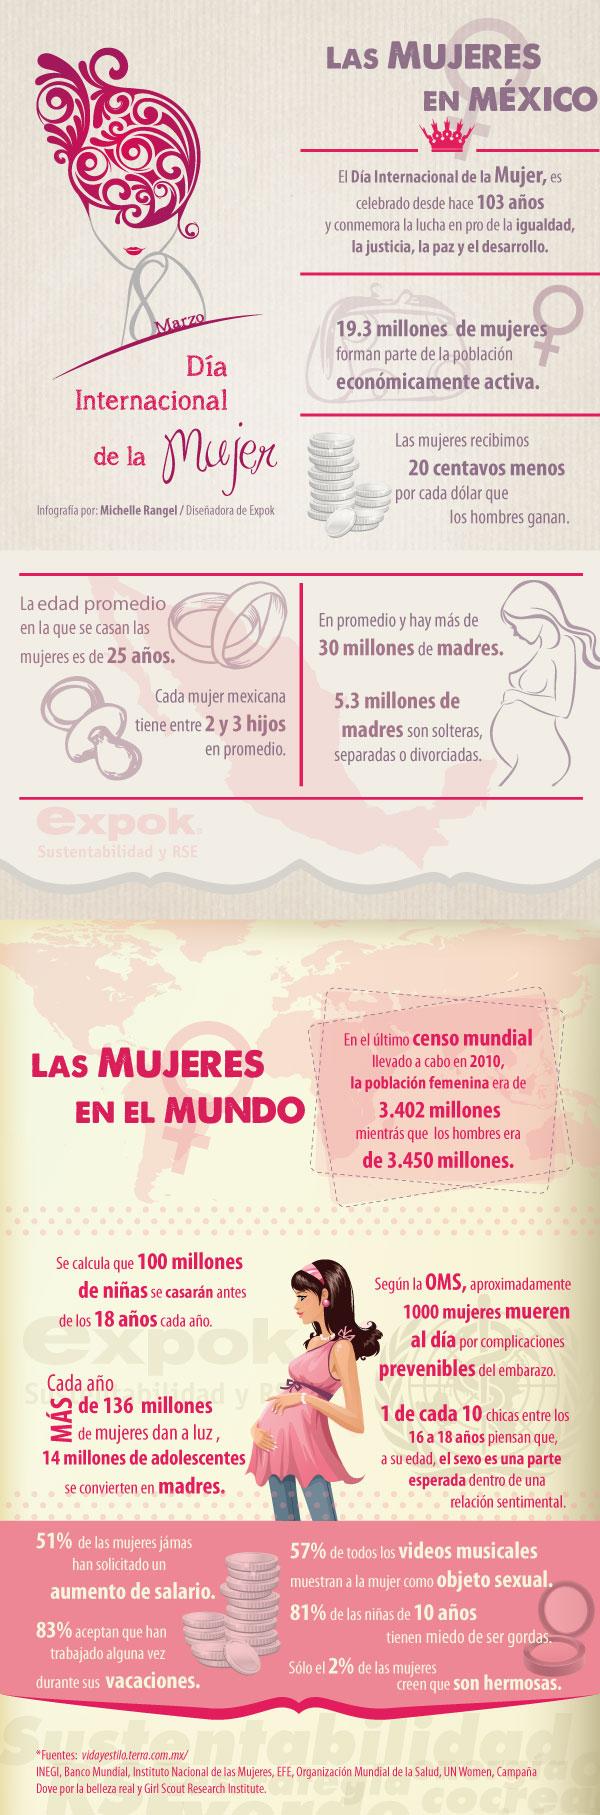 Las mujeres en cifras http://www.expoknews.com/2013/03/08/las-mujeres-en-cifras/